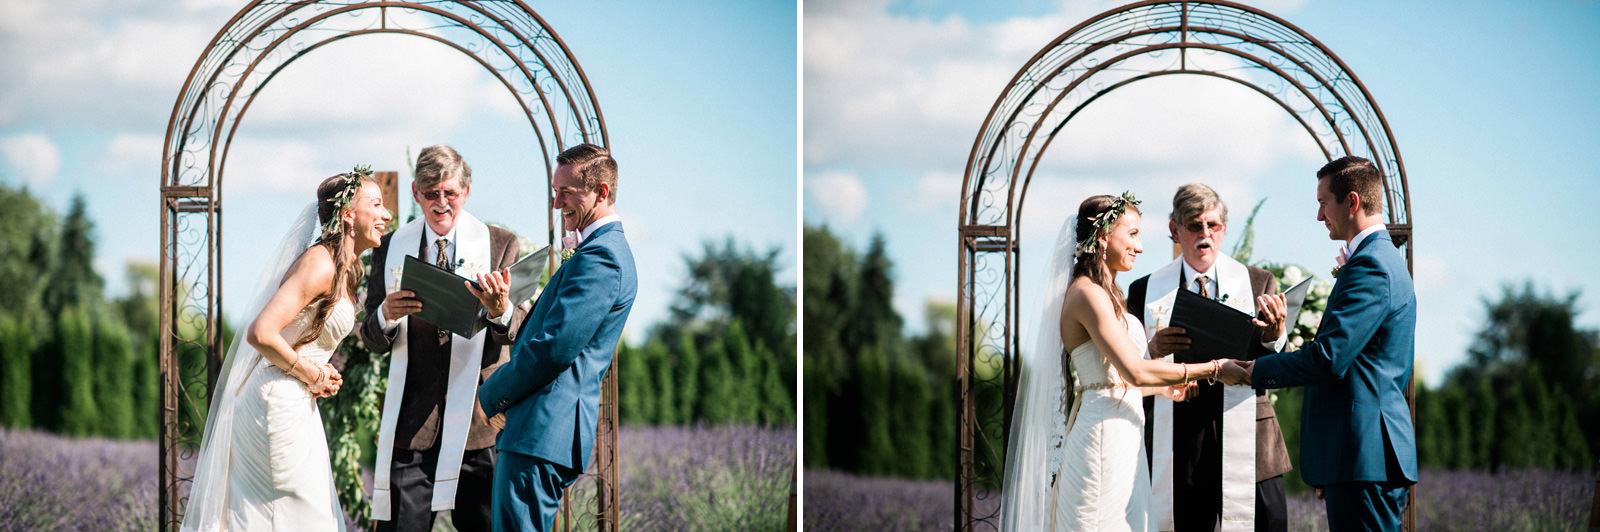 044-woodinville-lavendar-farm-wedding-with-golden-glowy-photos.jpg